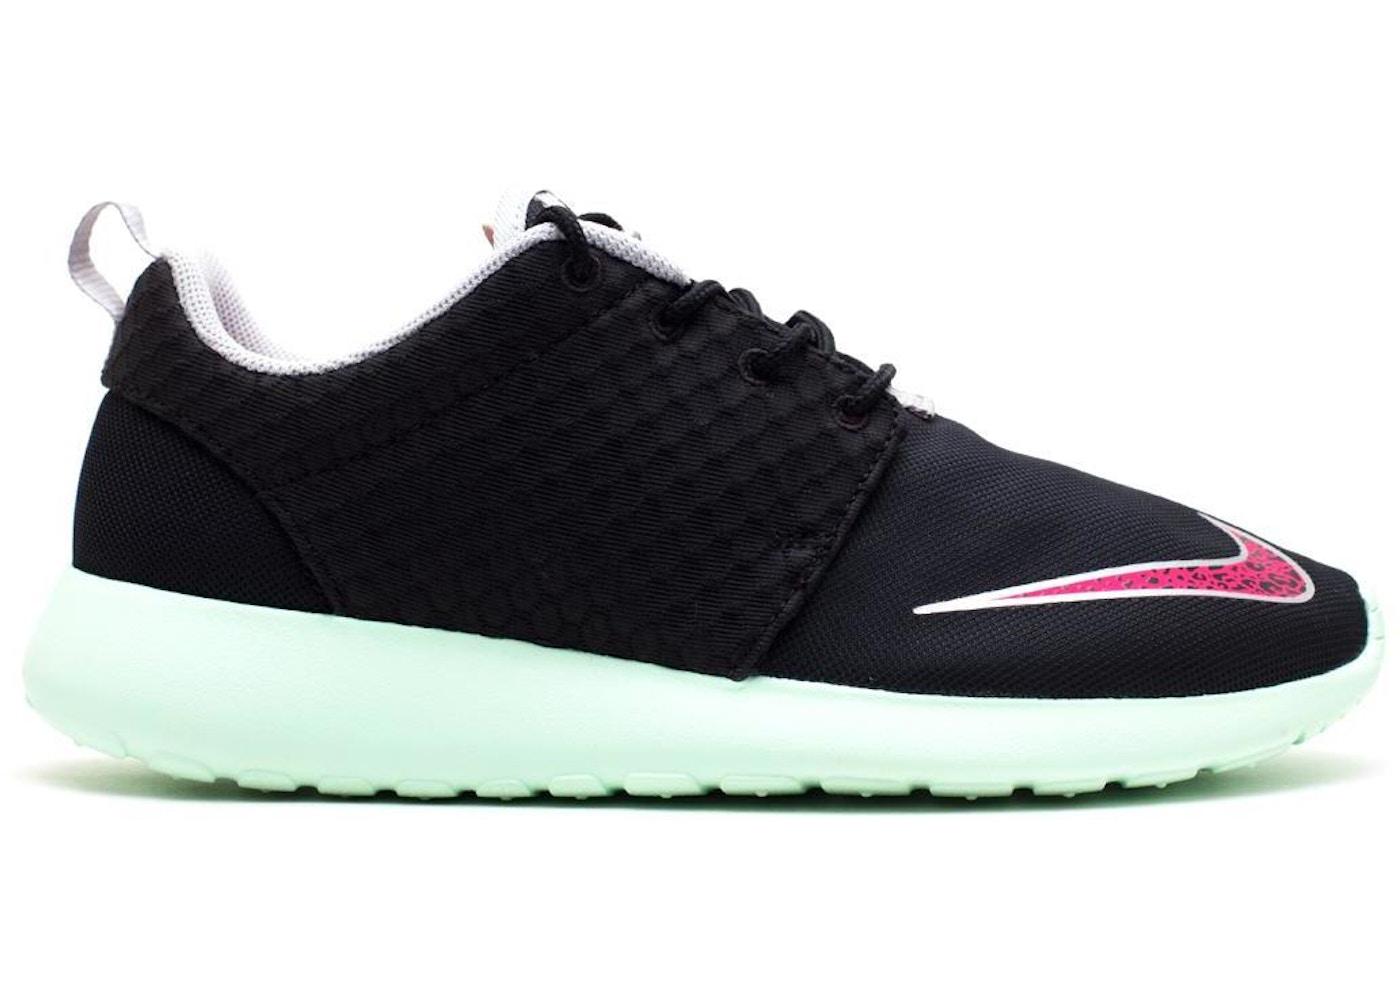 c808cb081144 Nike Roshe Run FB Yeezy - 580573-063